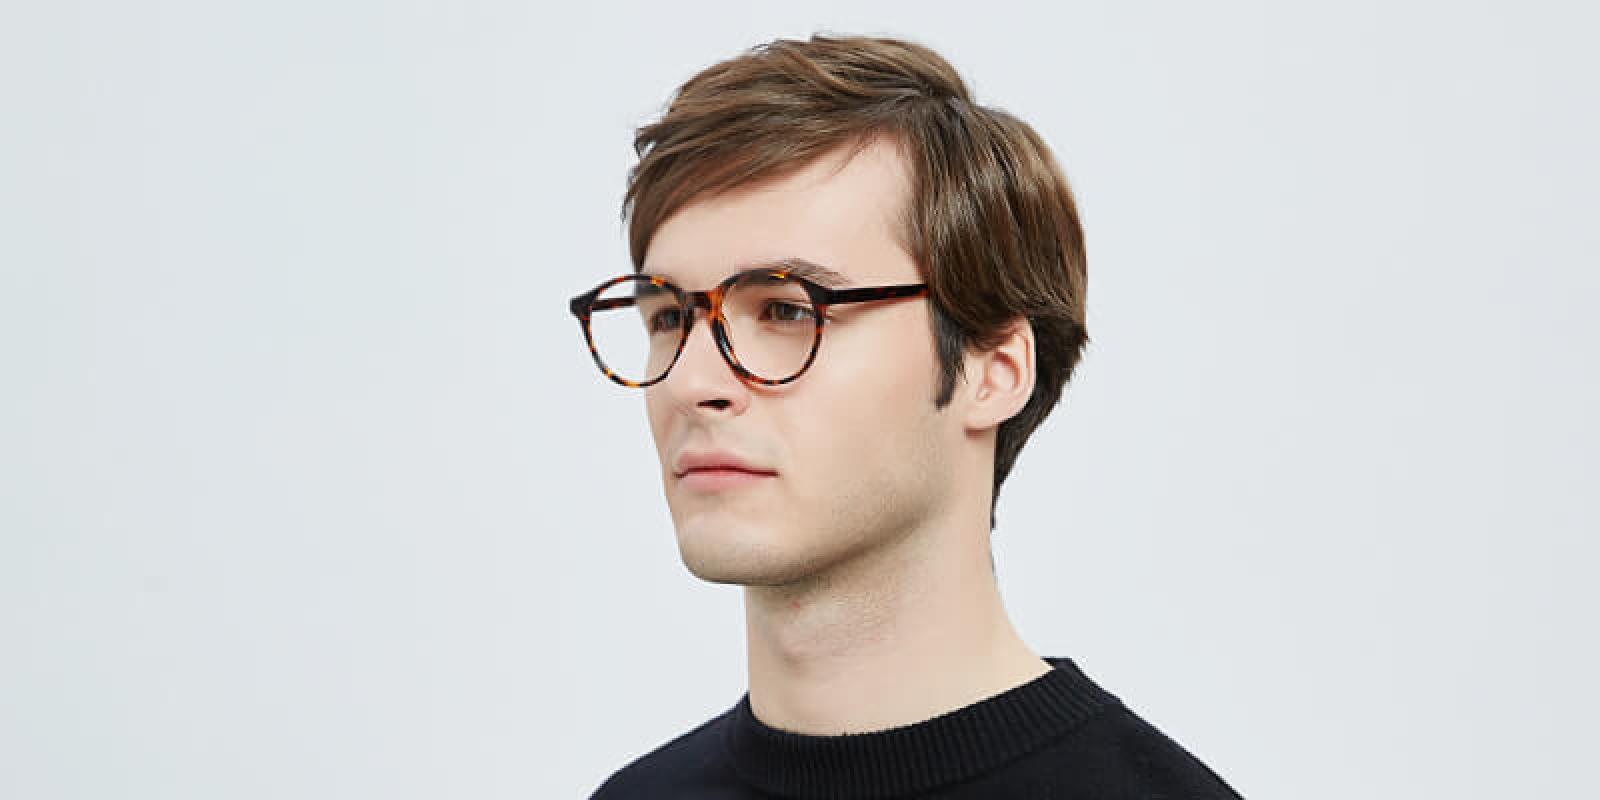 Bellona-Tortoise-Acetate-Eyeglasses-detail2